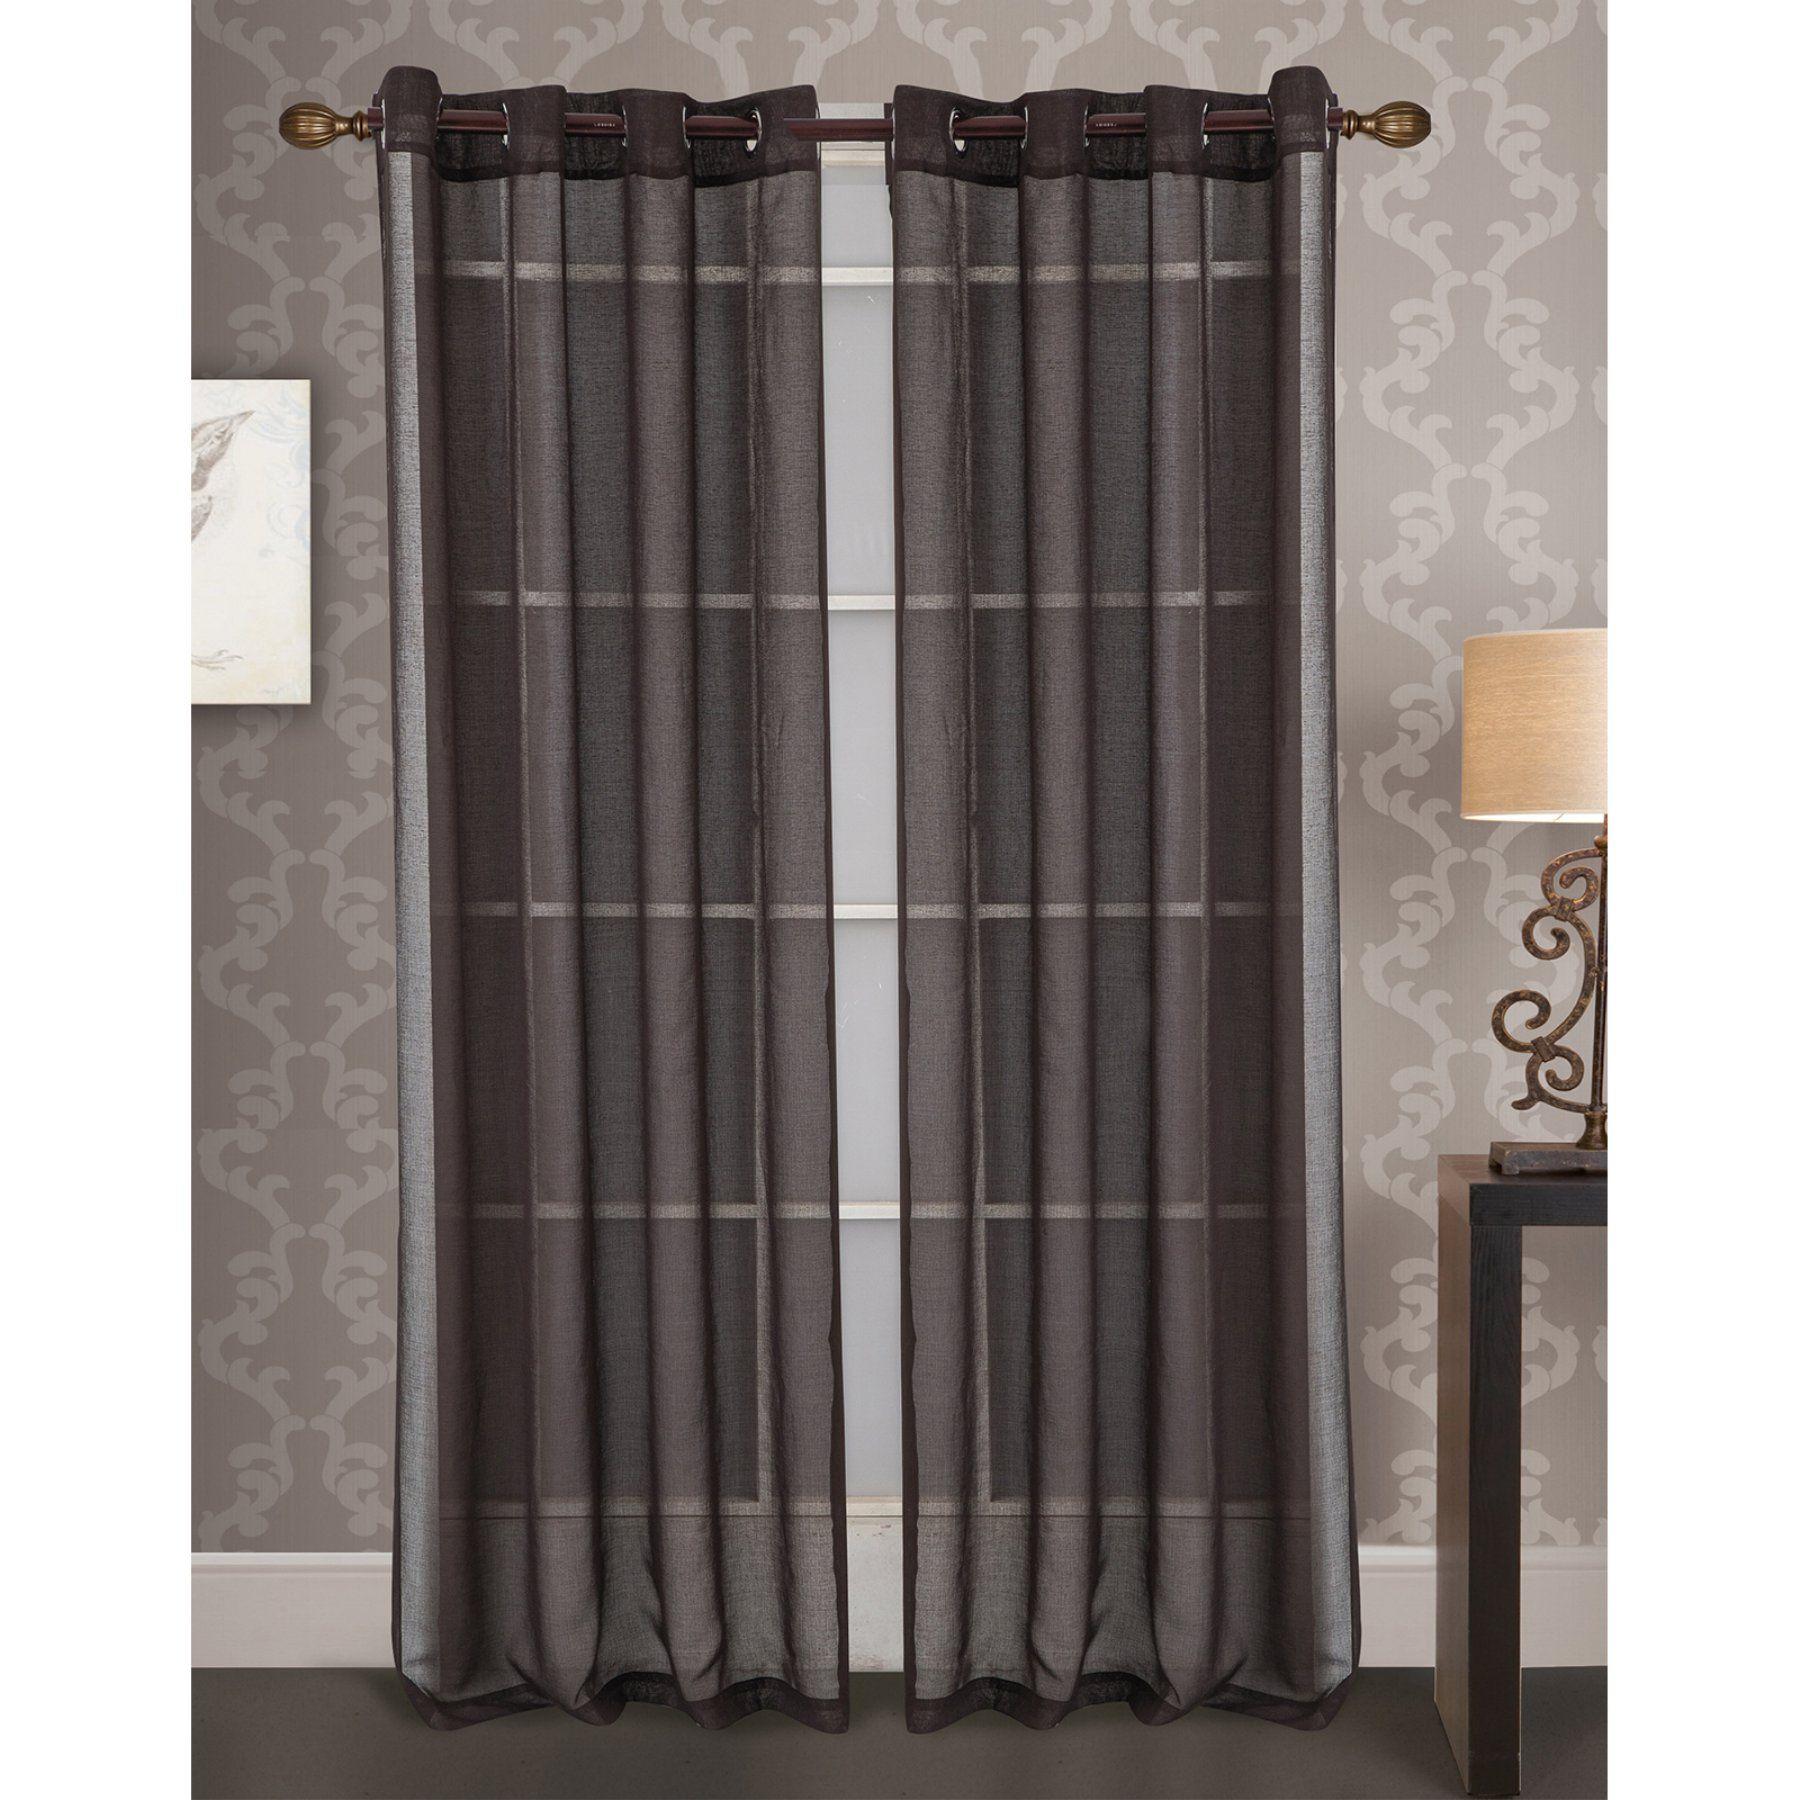 Rt Designers Collection Rainier Doily Grommet Curtain Panel